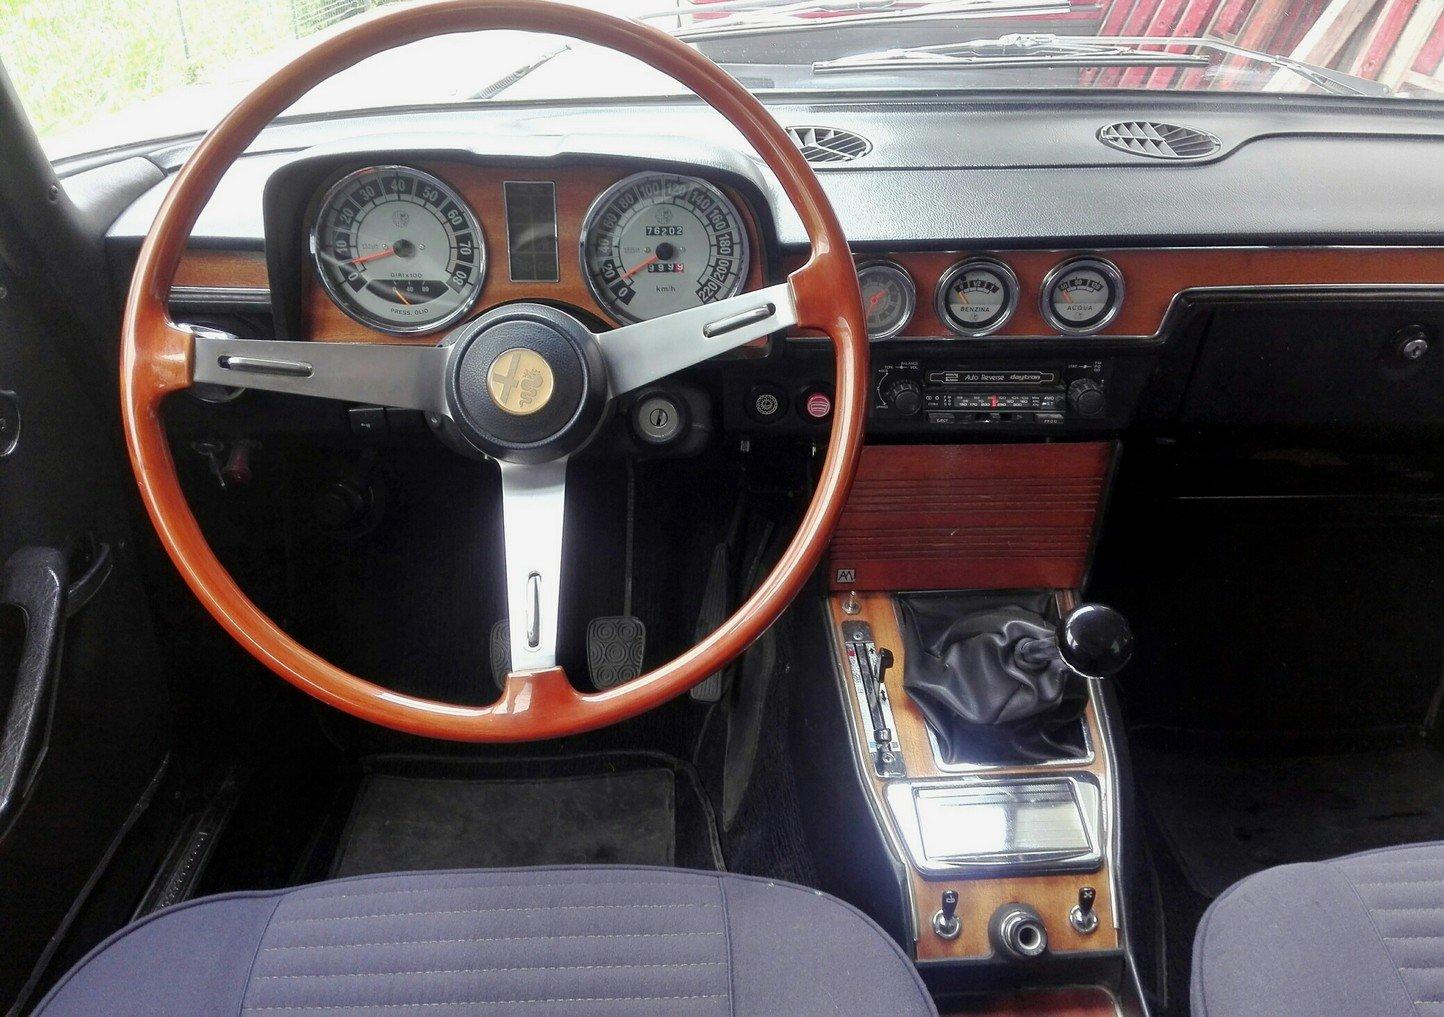 1973 Pristine alfa 2000 berlina bertone, 76 k km! For Sale (picture 5 of 6)